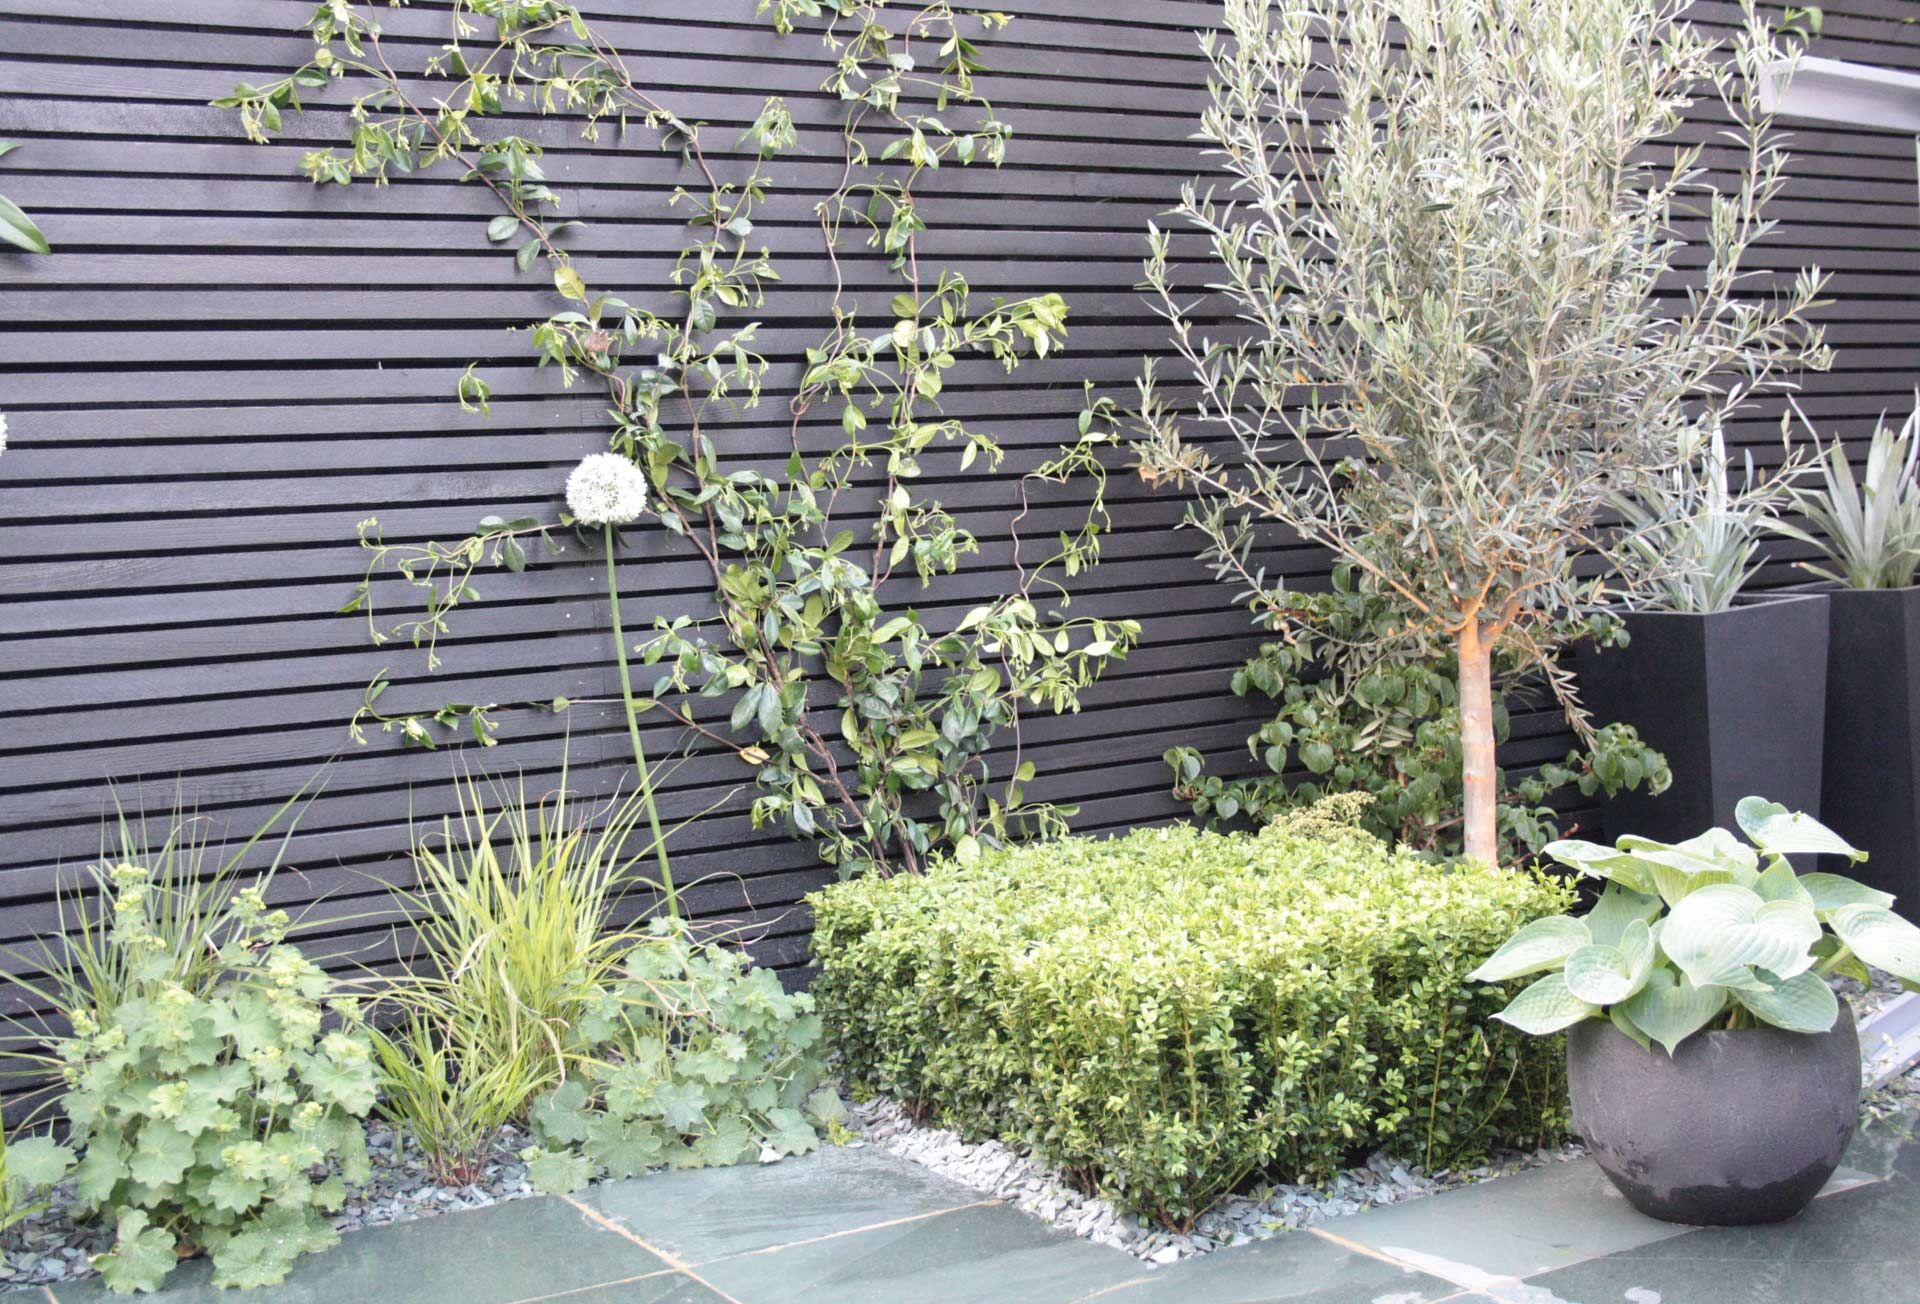 Contemporary-look urban garden design in London | Diseño ...